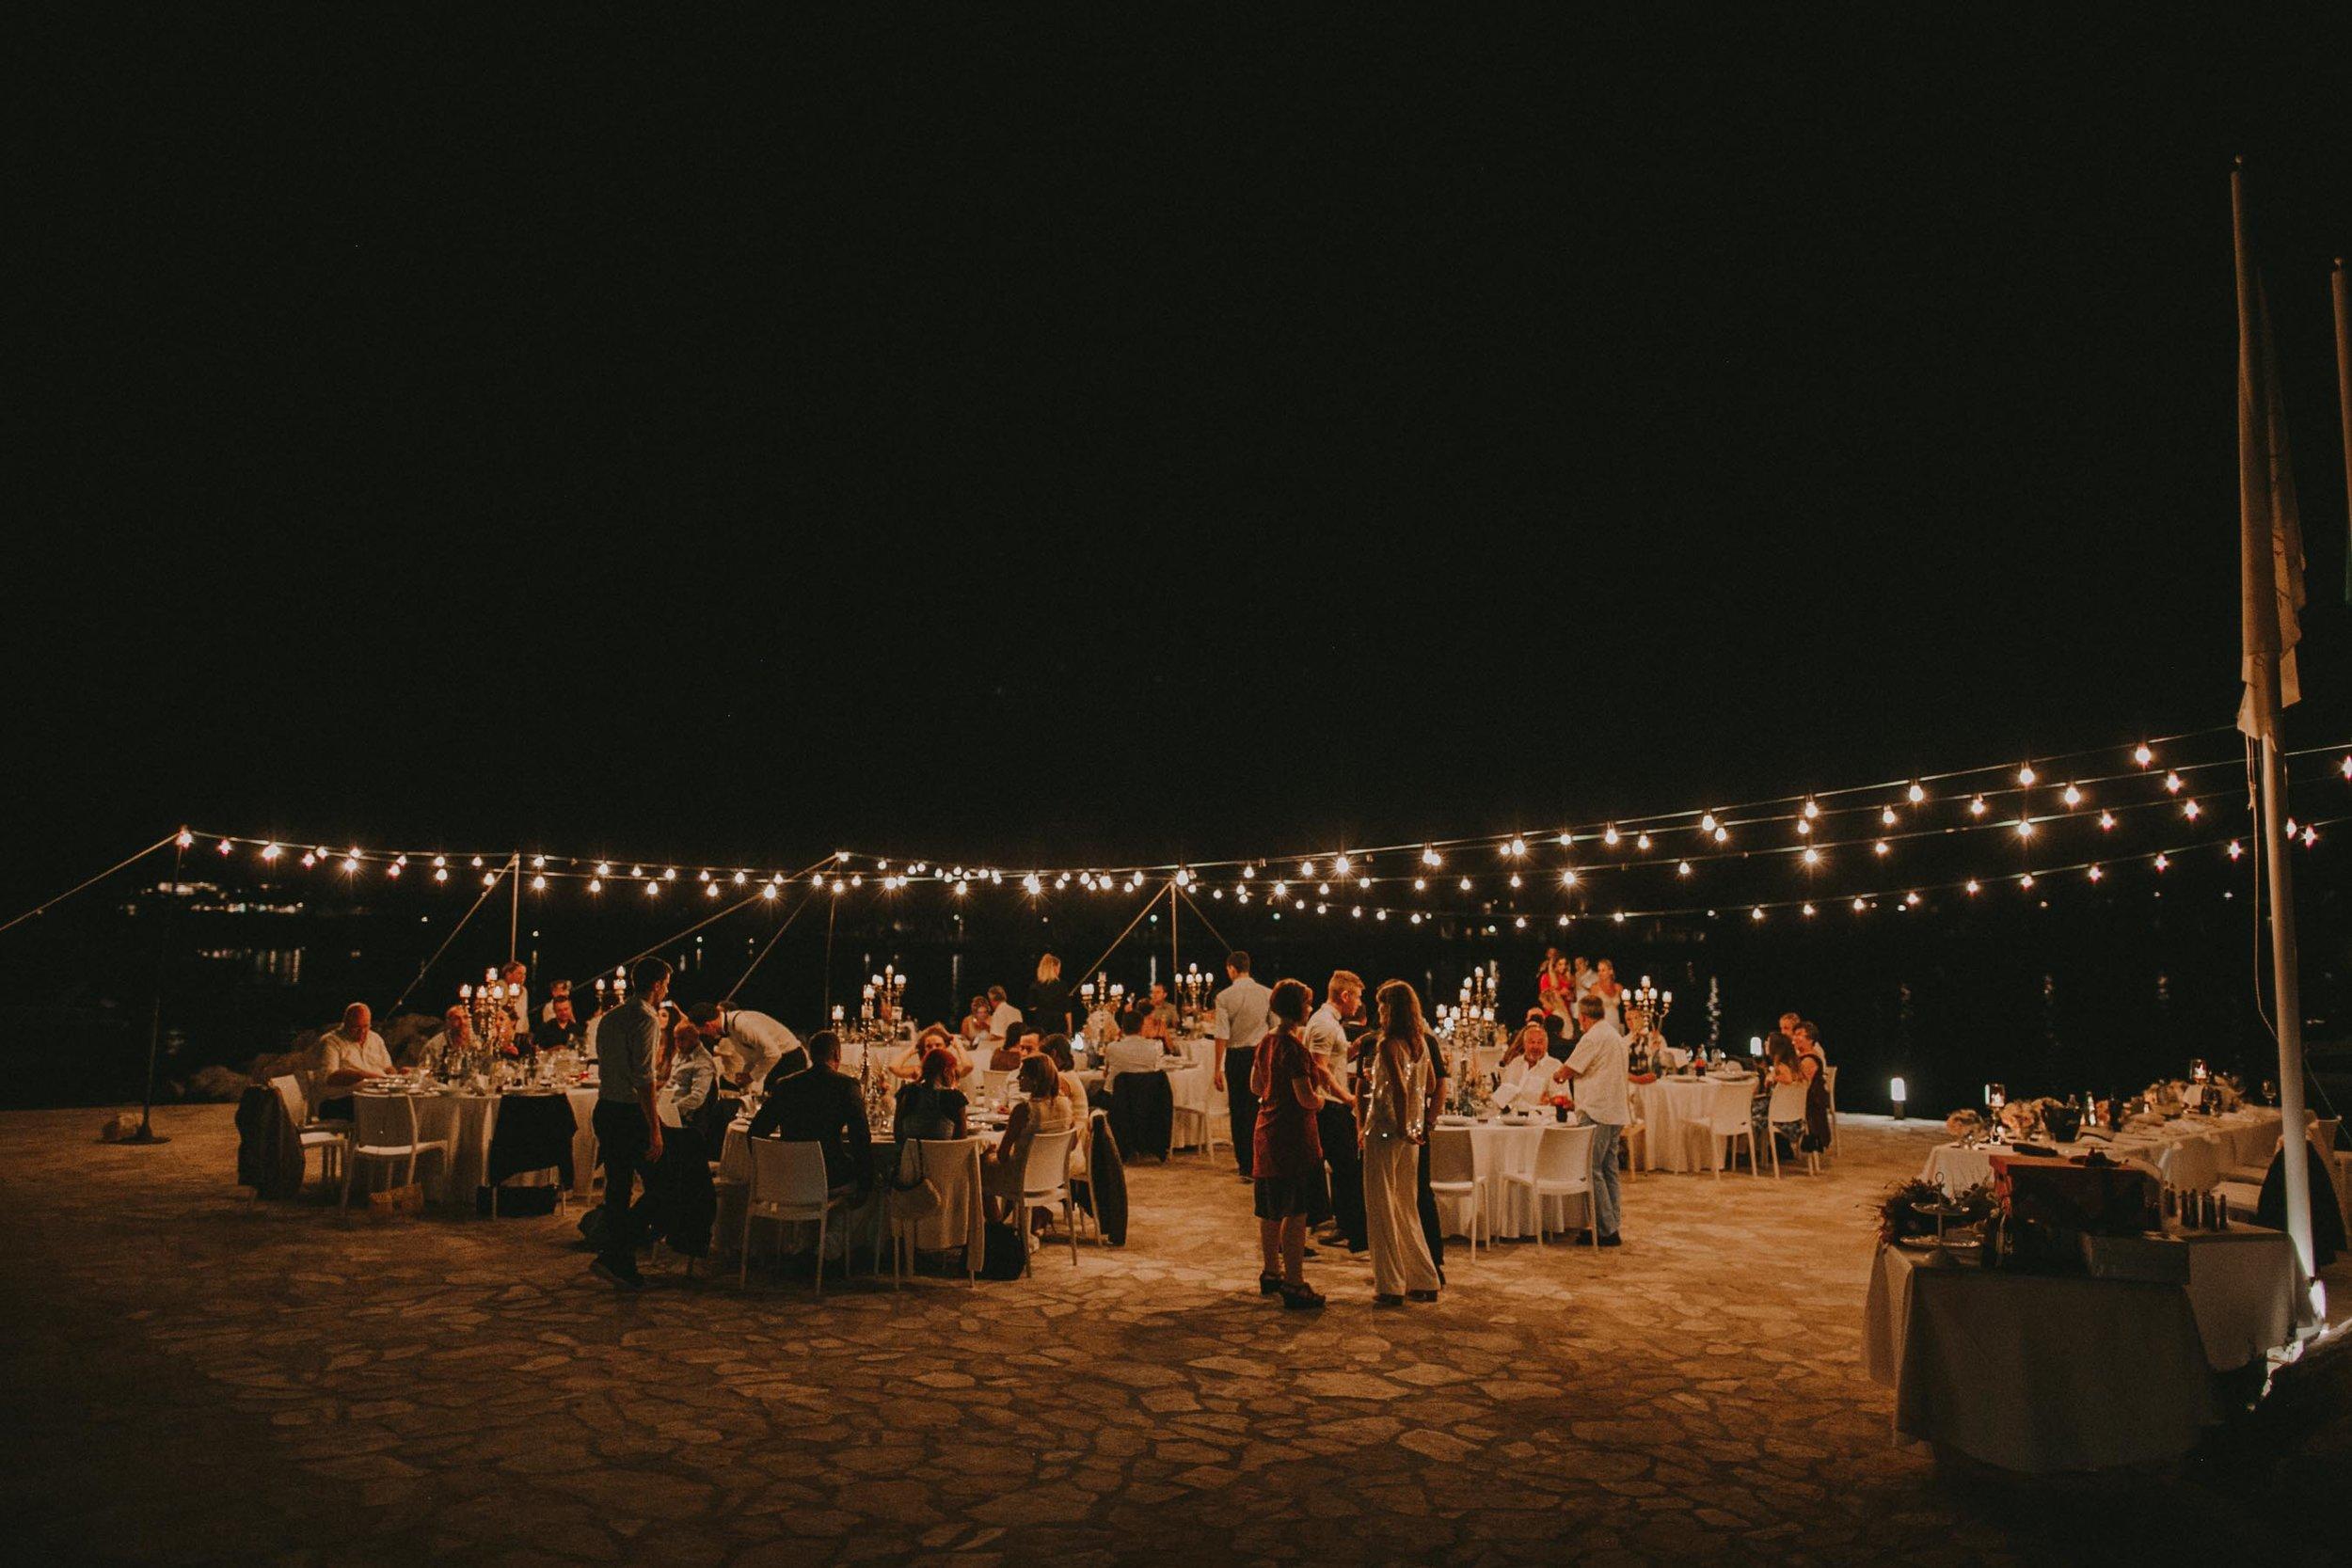 sylvia&dimitri-Wedding-Crvena_Luka-Croatia-105(9465).jpg